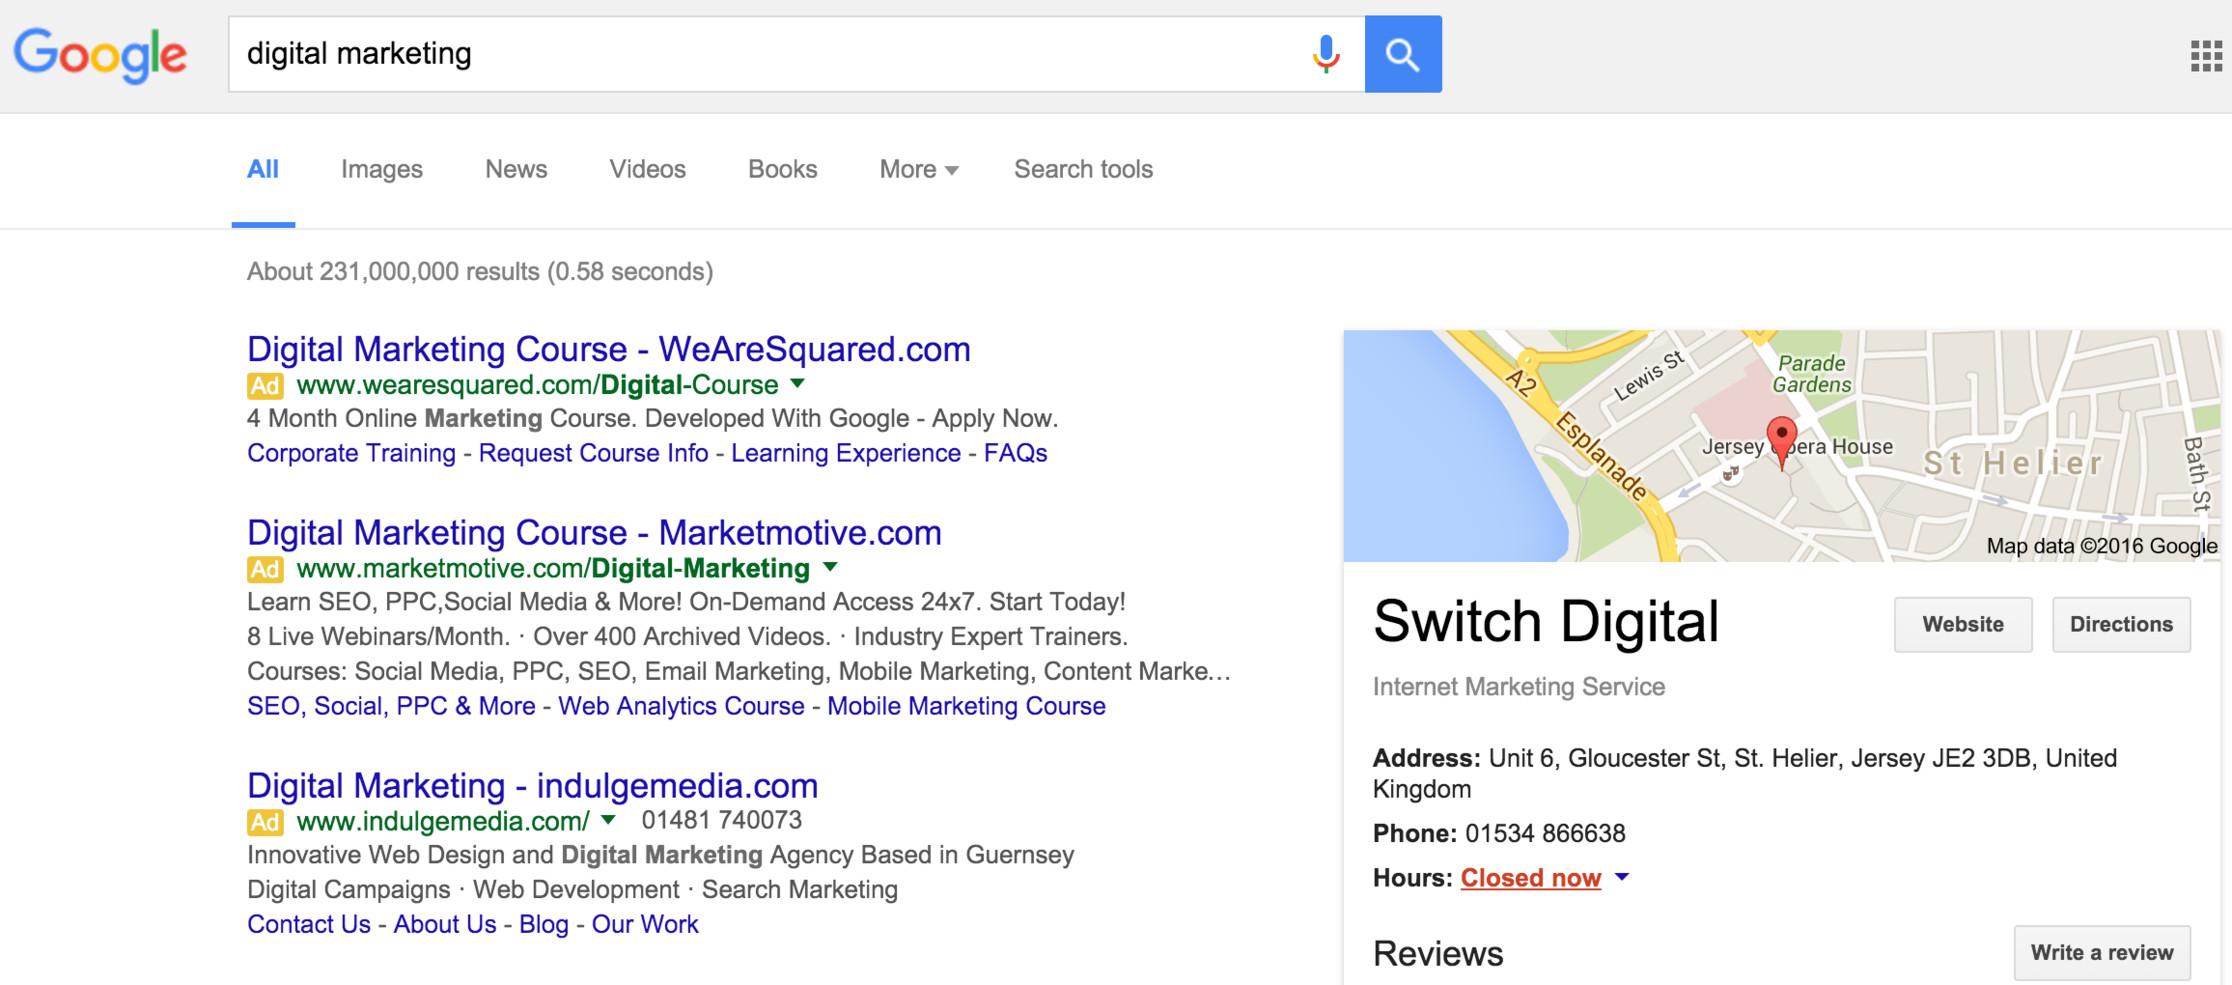 Switch digital marketing agency on google.je